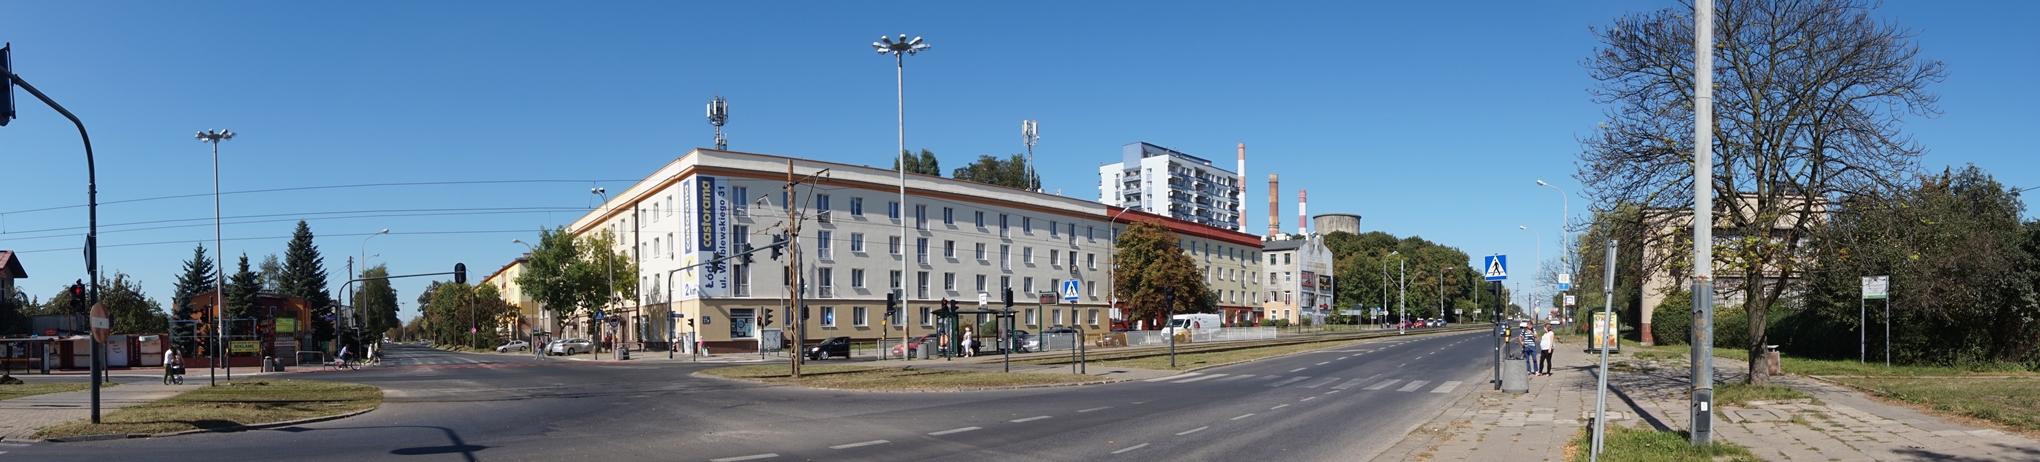 Al. Politechniki / Obywatelska